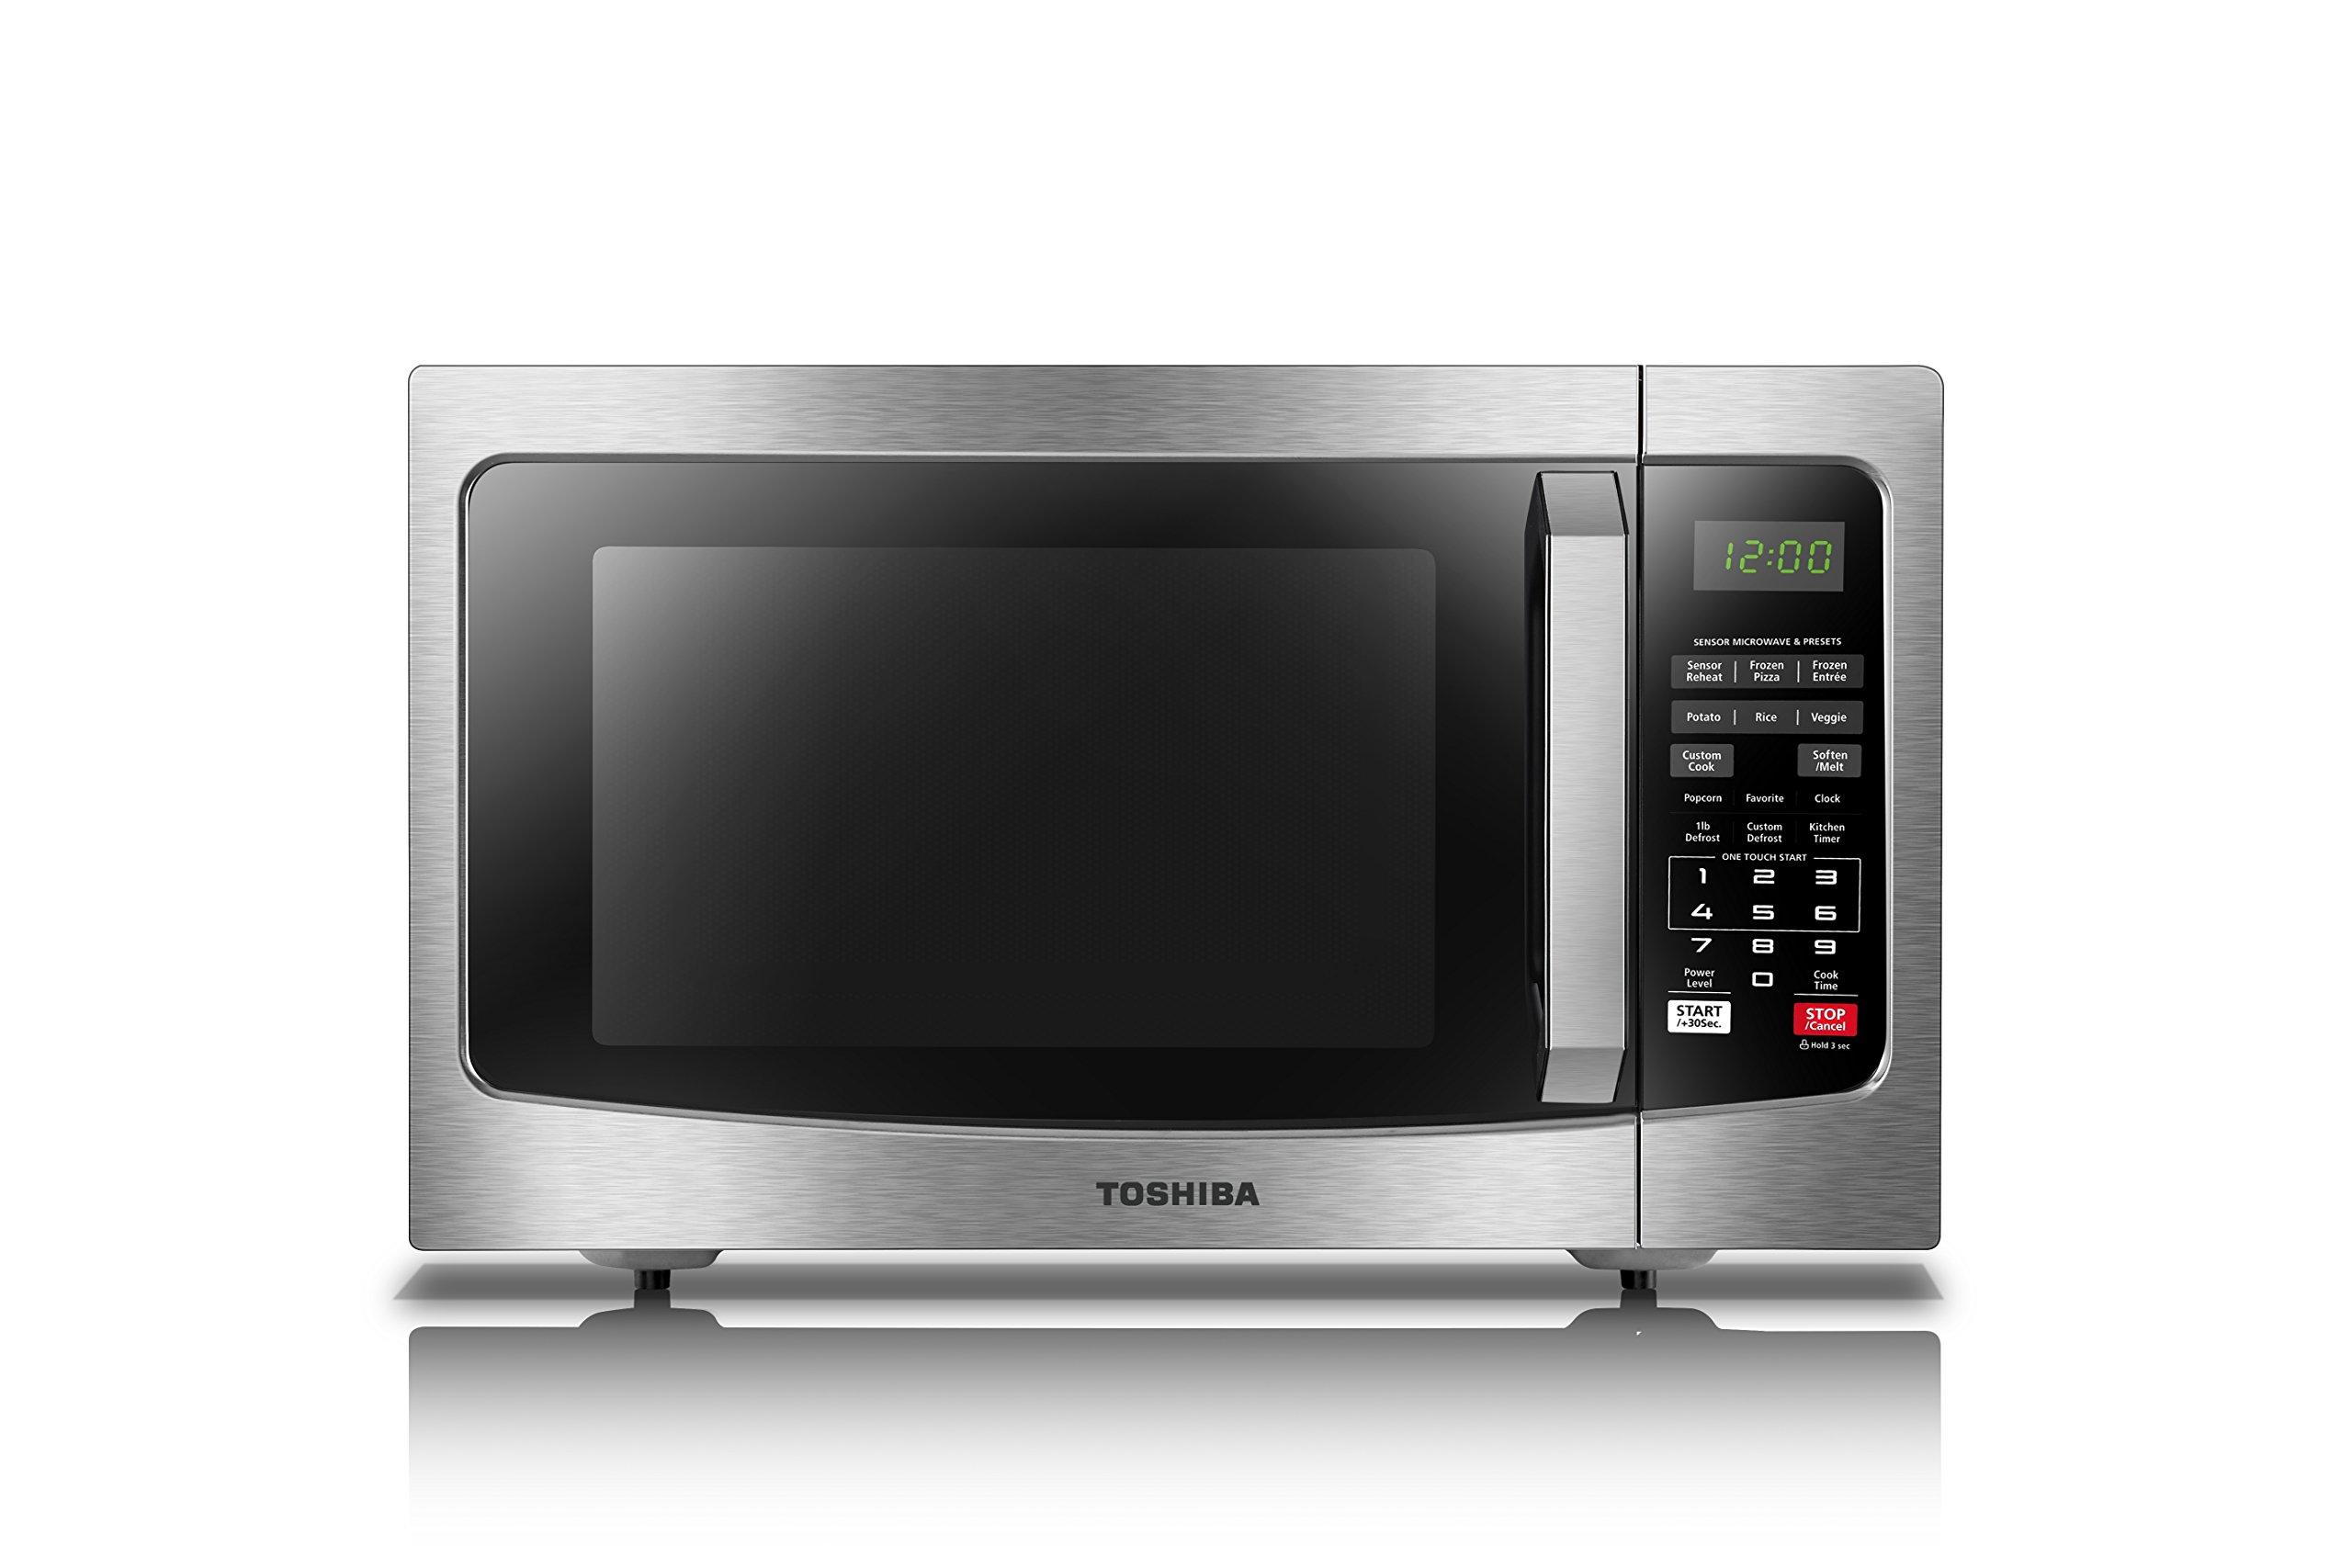 Toshiba EM131A5C SS Microwave Interior Stainless